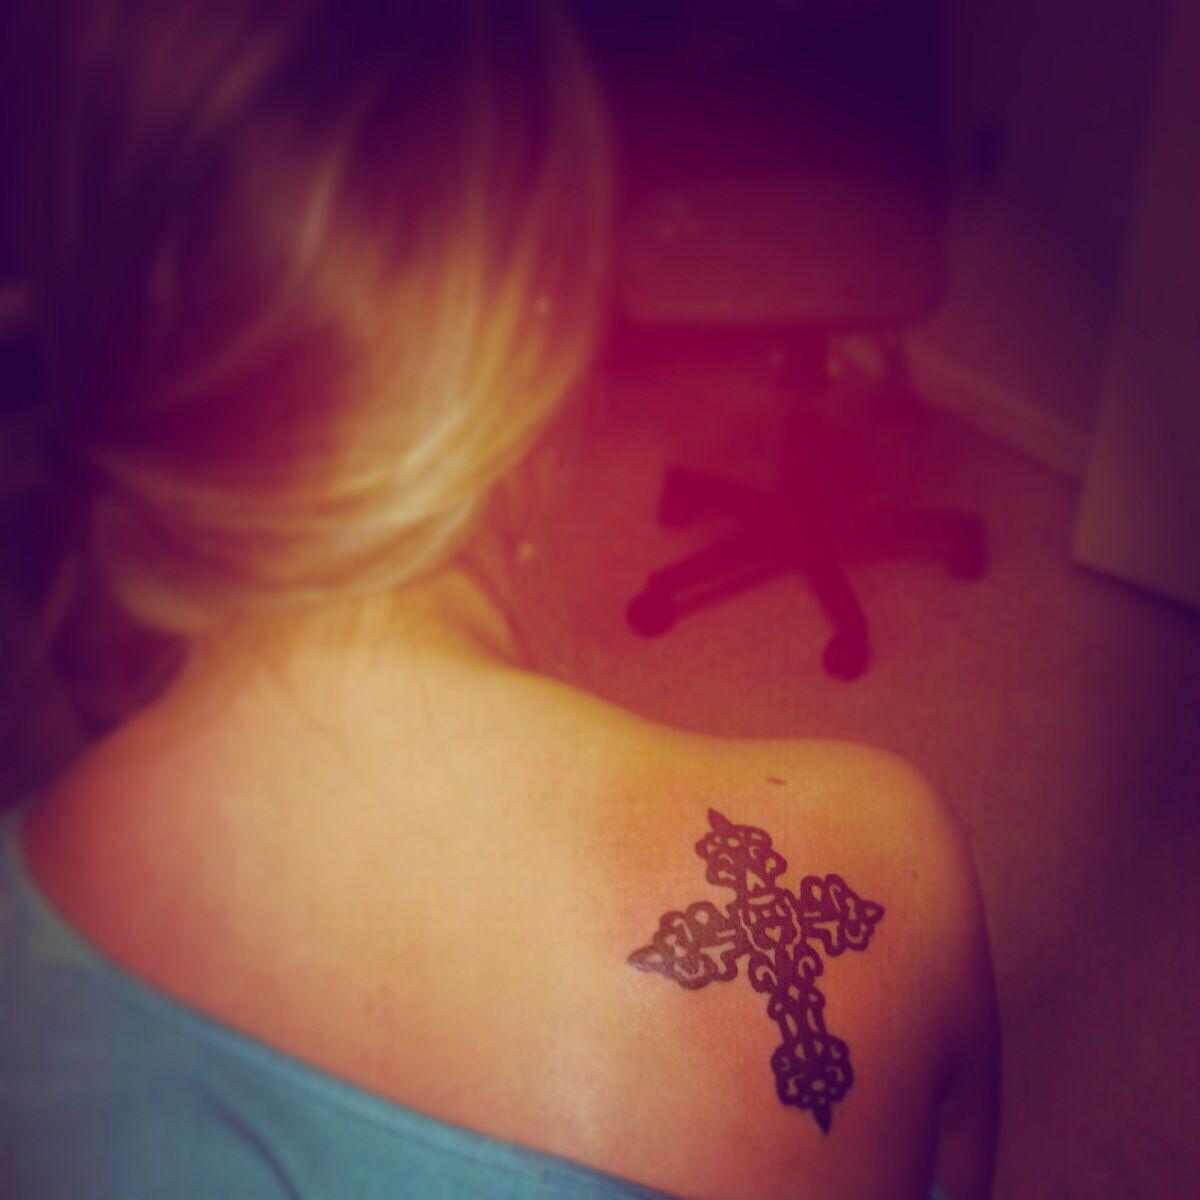 Best 25 Lifeline Tattoos Ideas On Pinterest: Best 25+ Cross Shoulder Tattoos Ideas On Pinterest